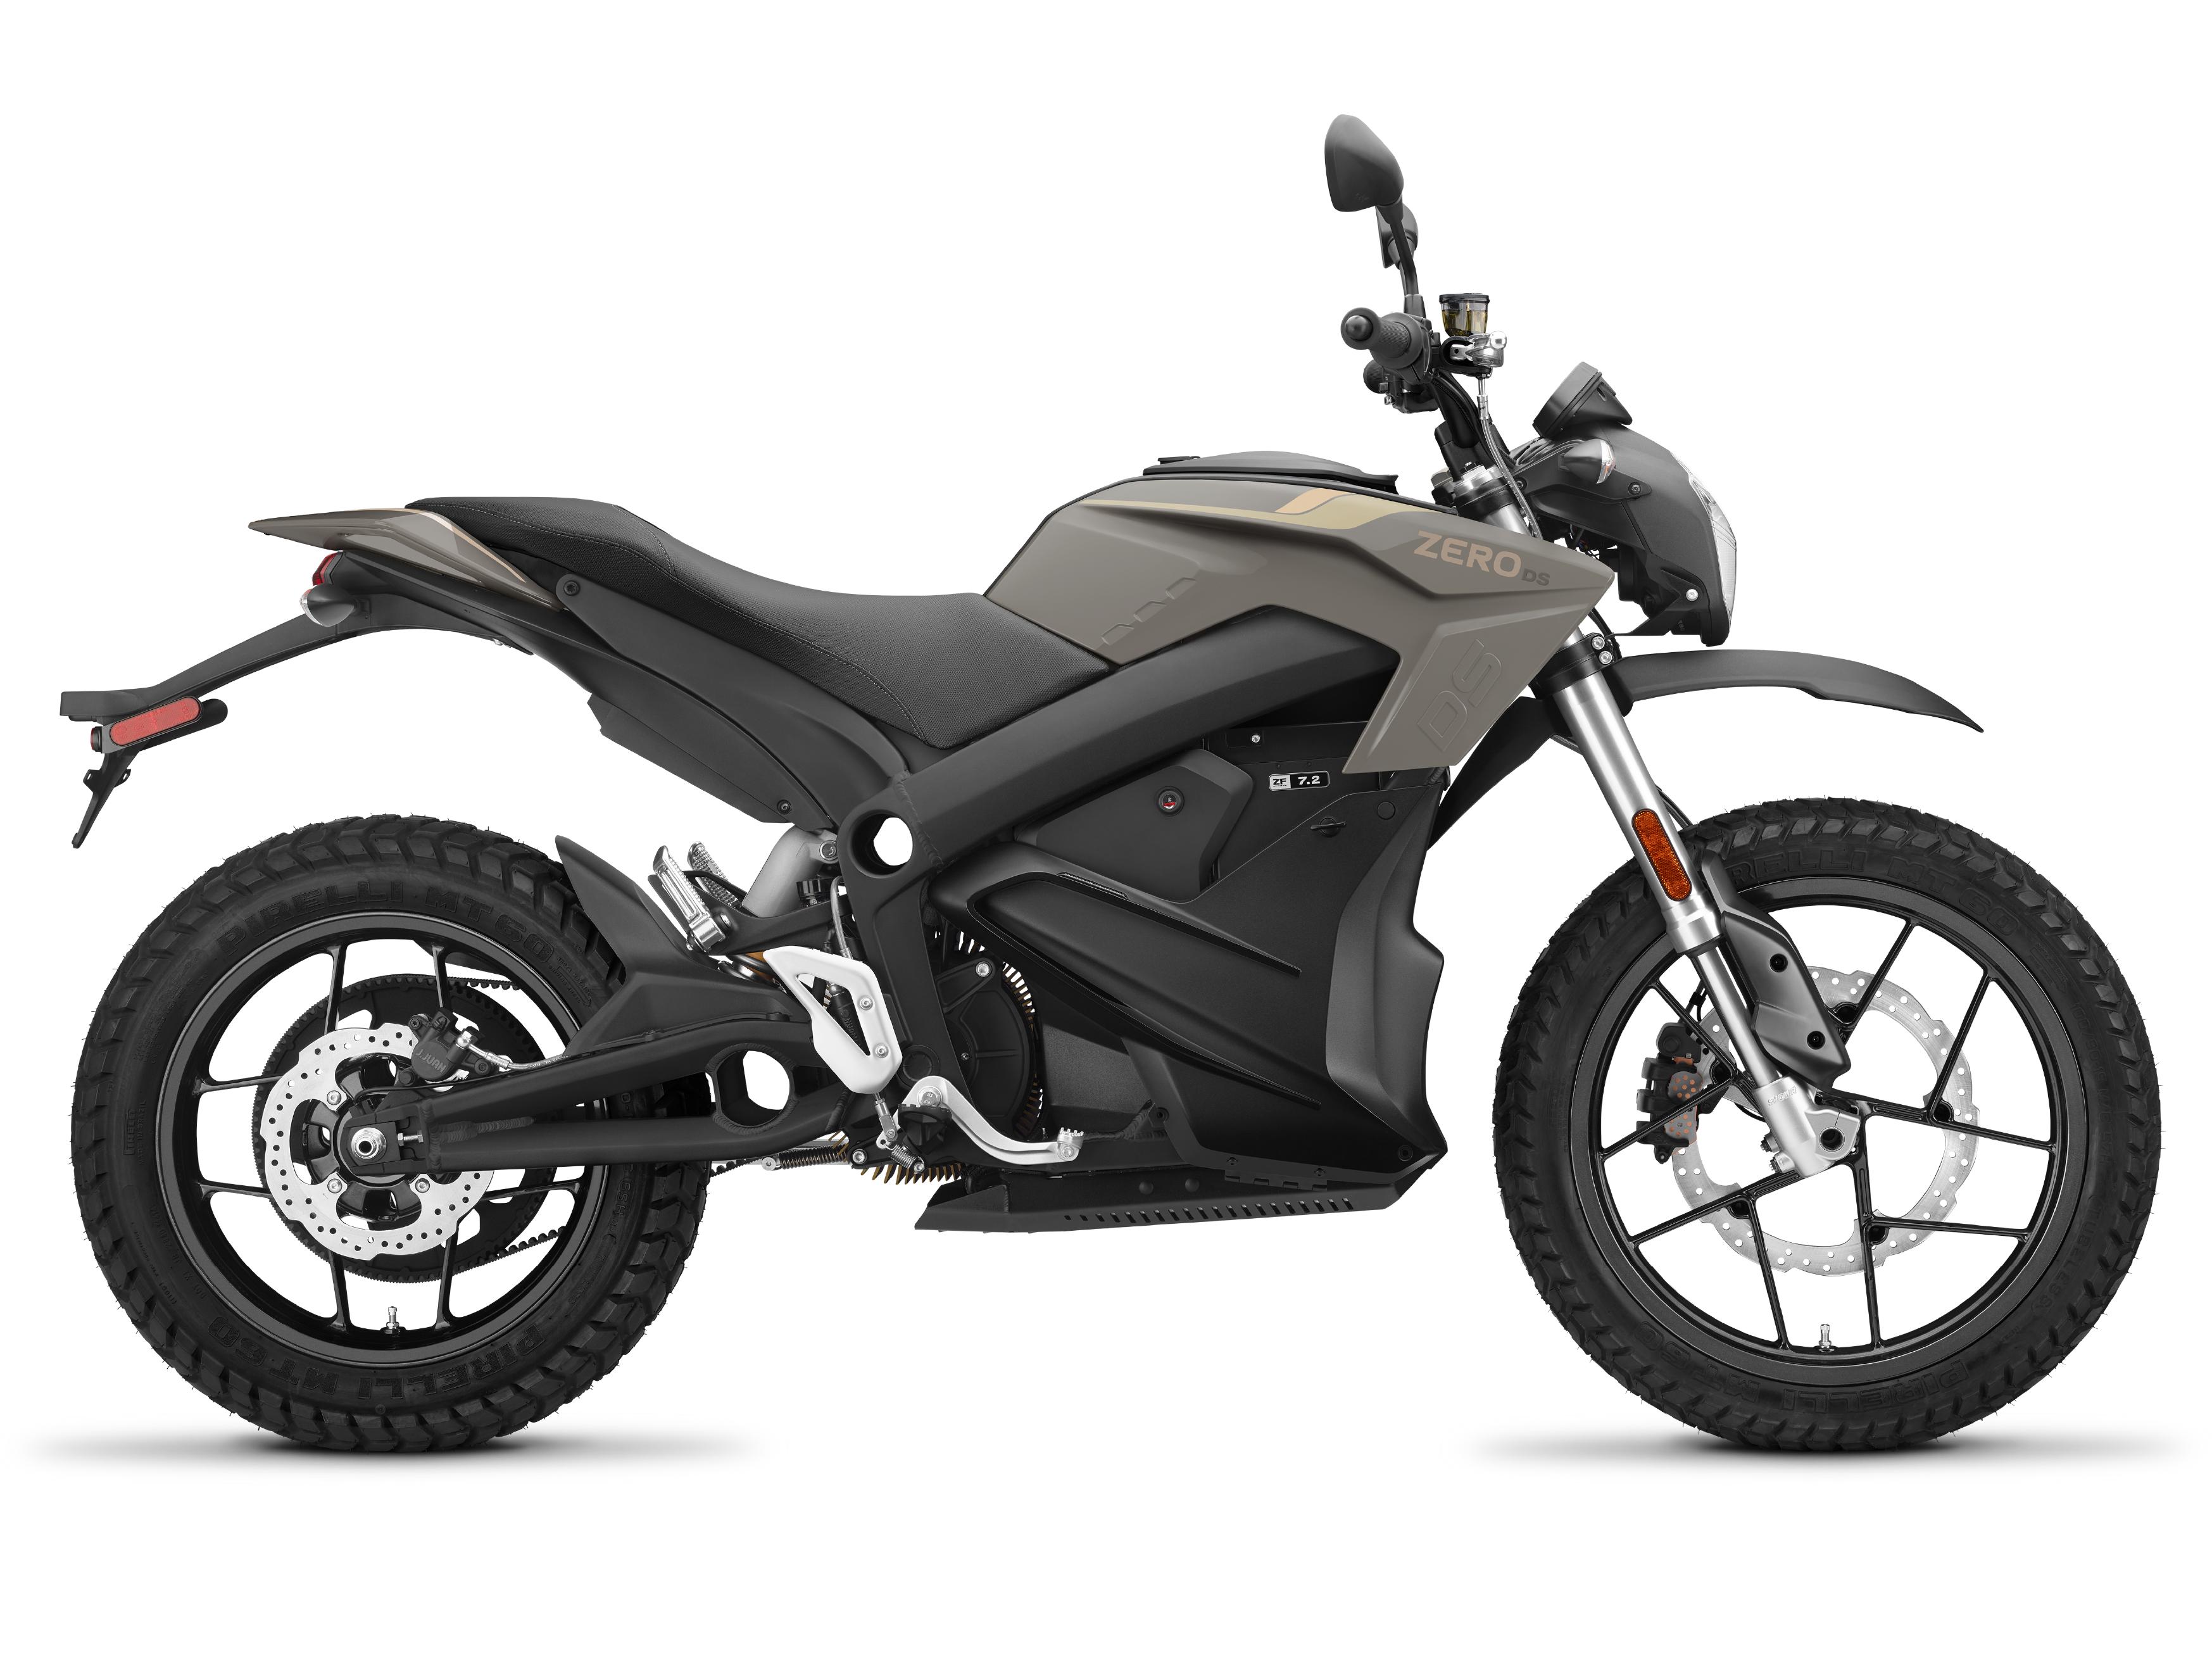 Zero S ZF14.4 11KW E-Motor